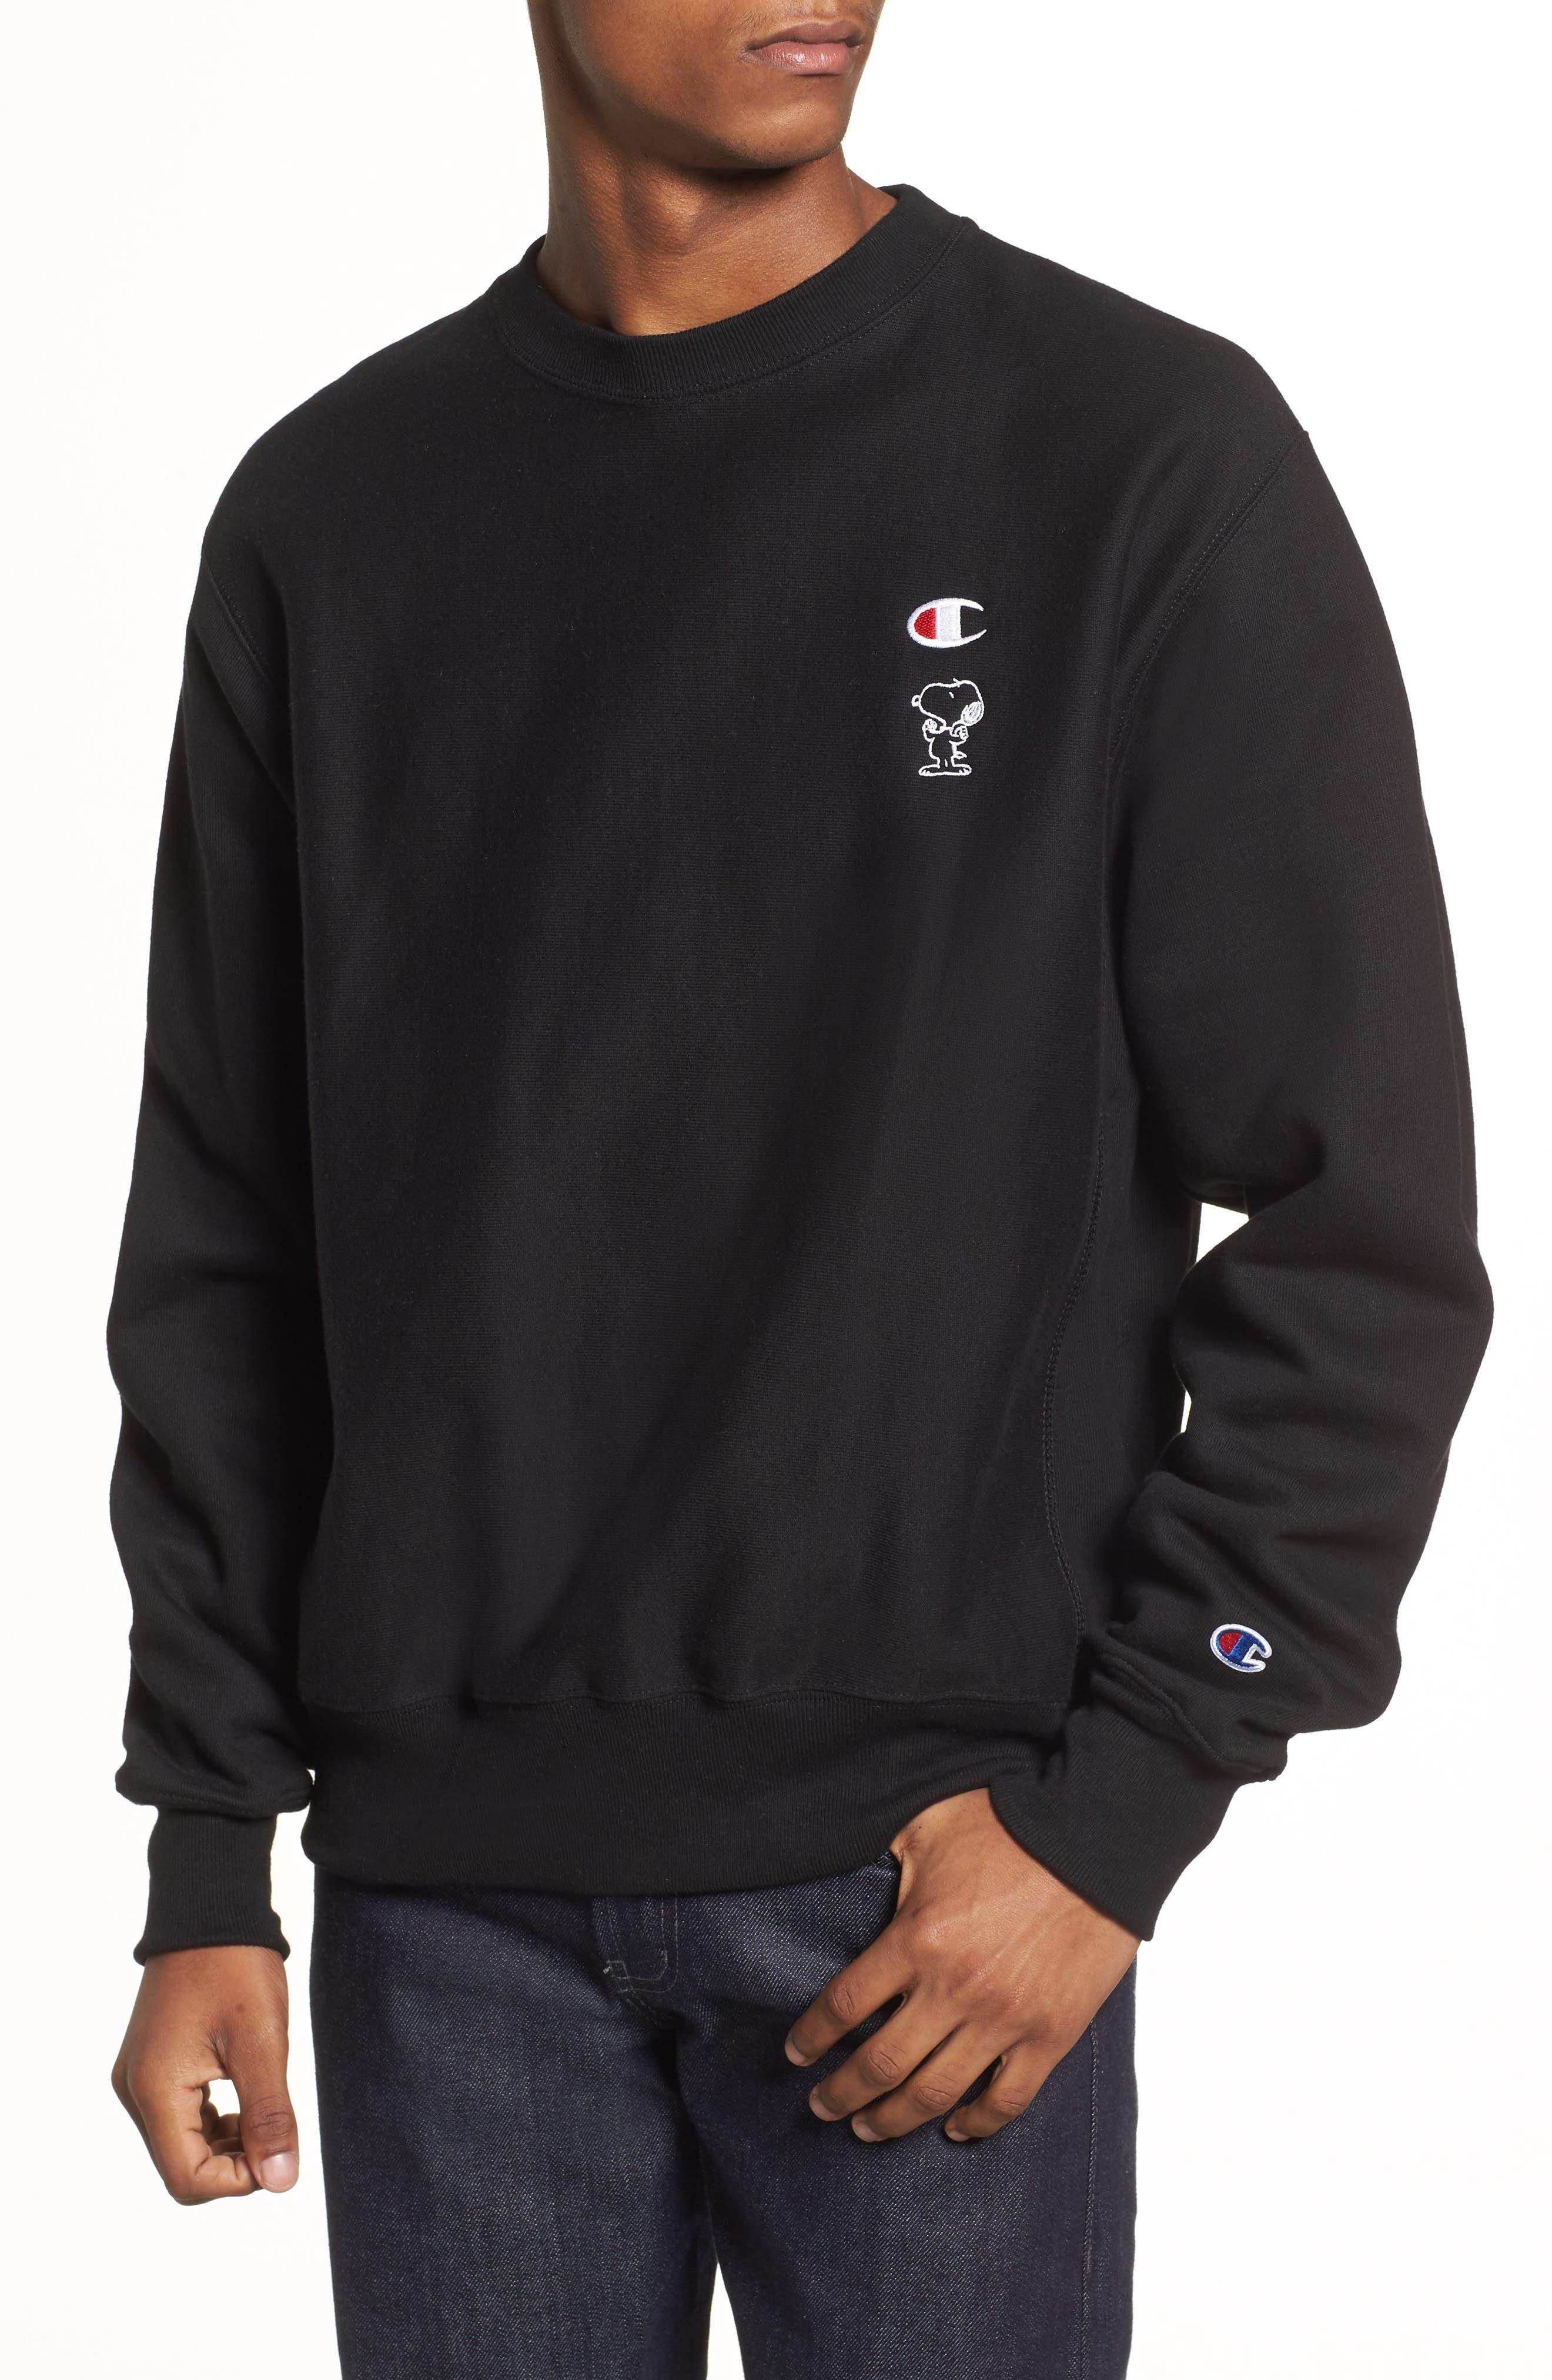 Snoopy Unisex Sweatshirt,                             Main thumbnail 1, color,                             001